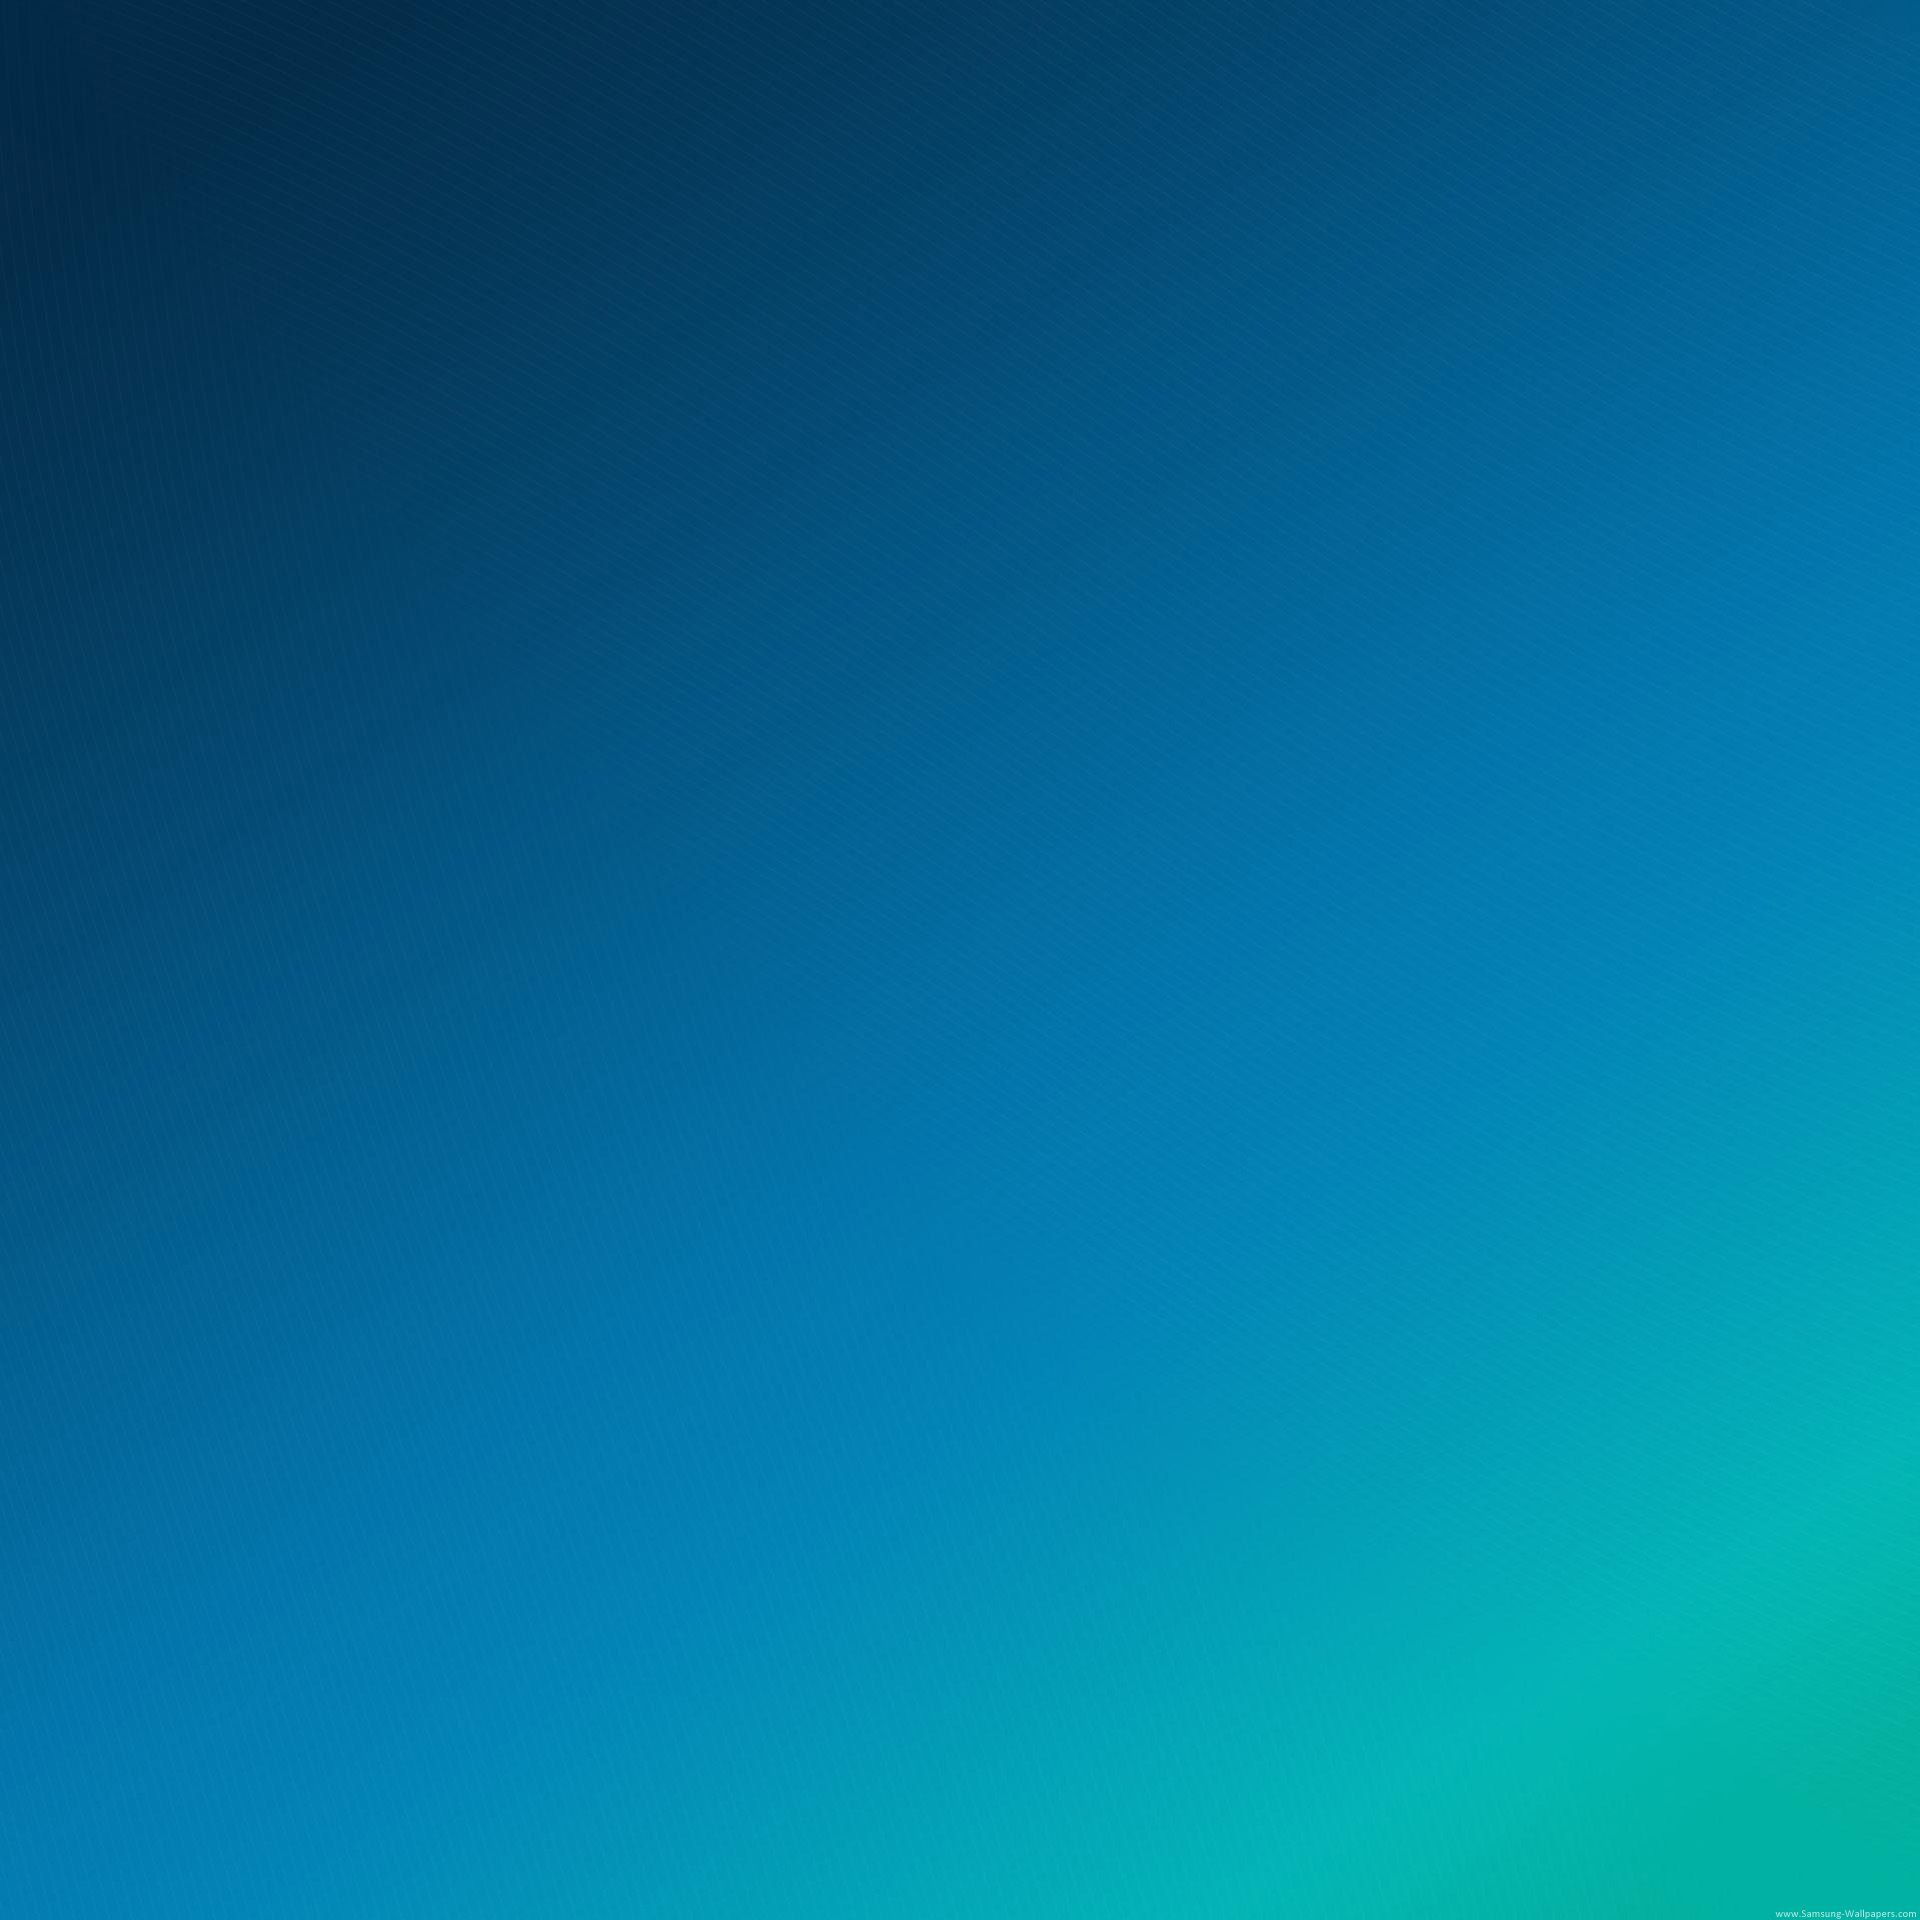 samsung wallpaper blue: Samsung Galaxy Blue Wallpaper